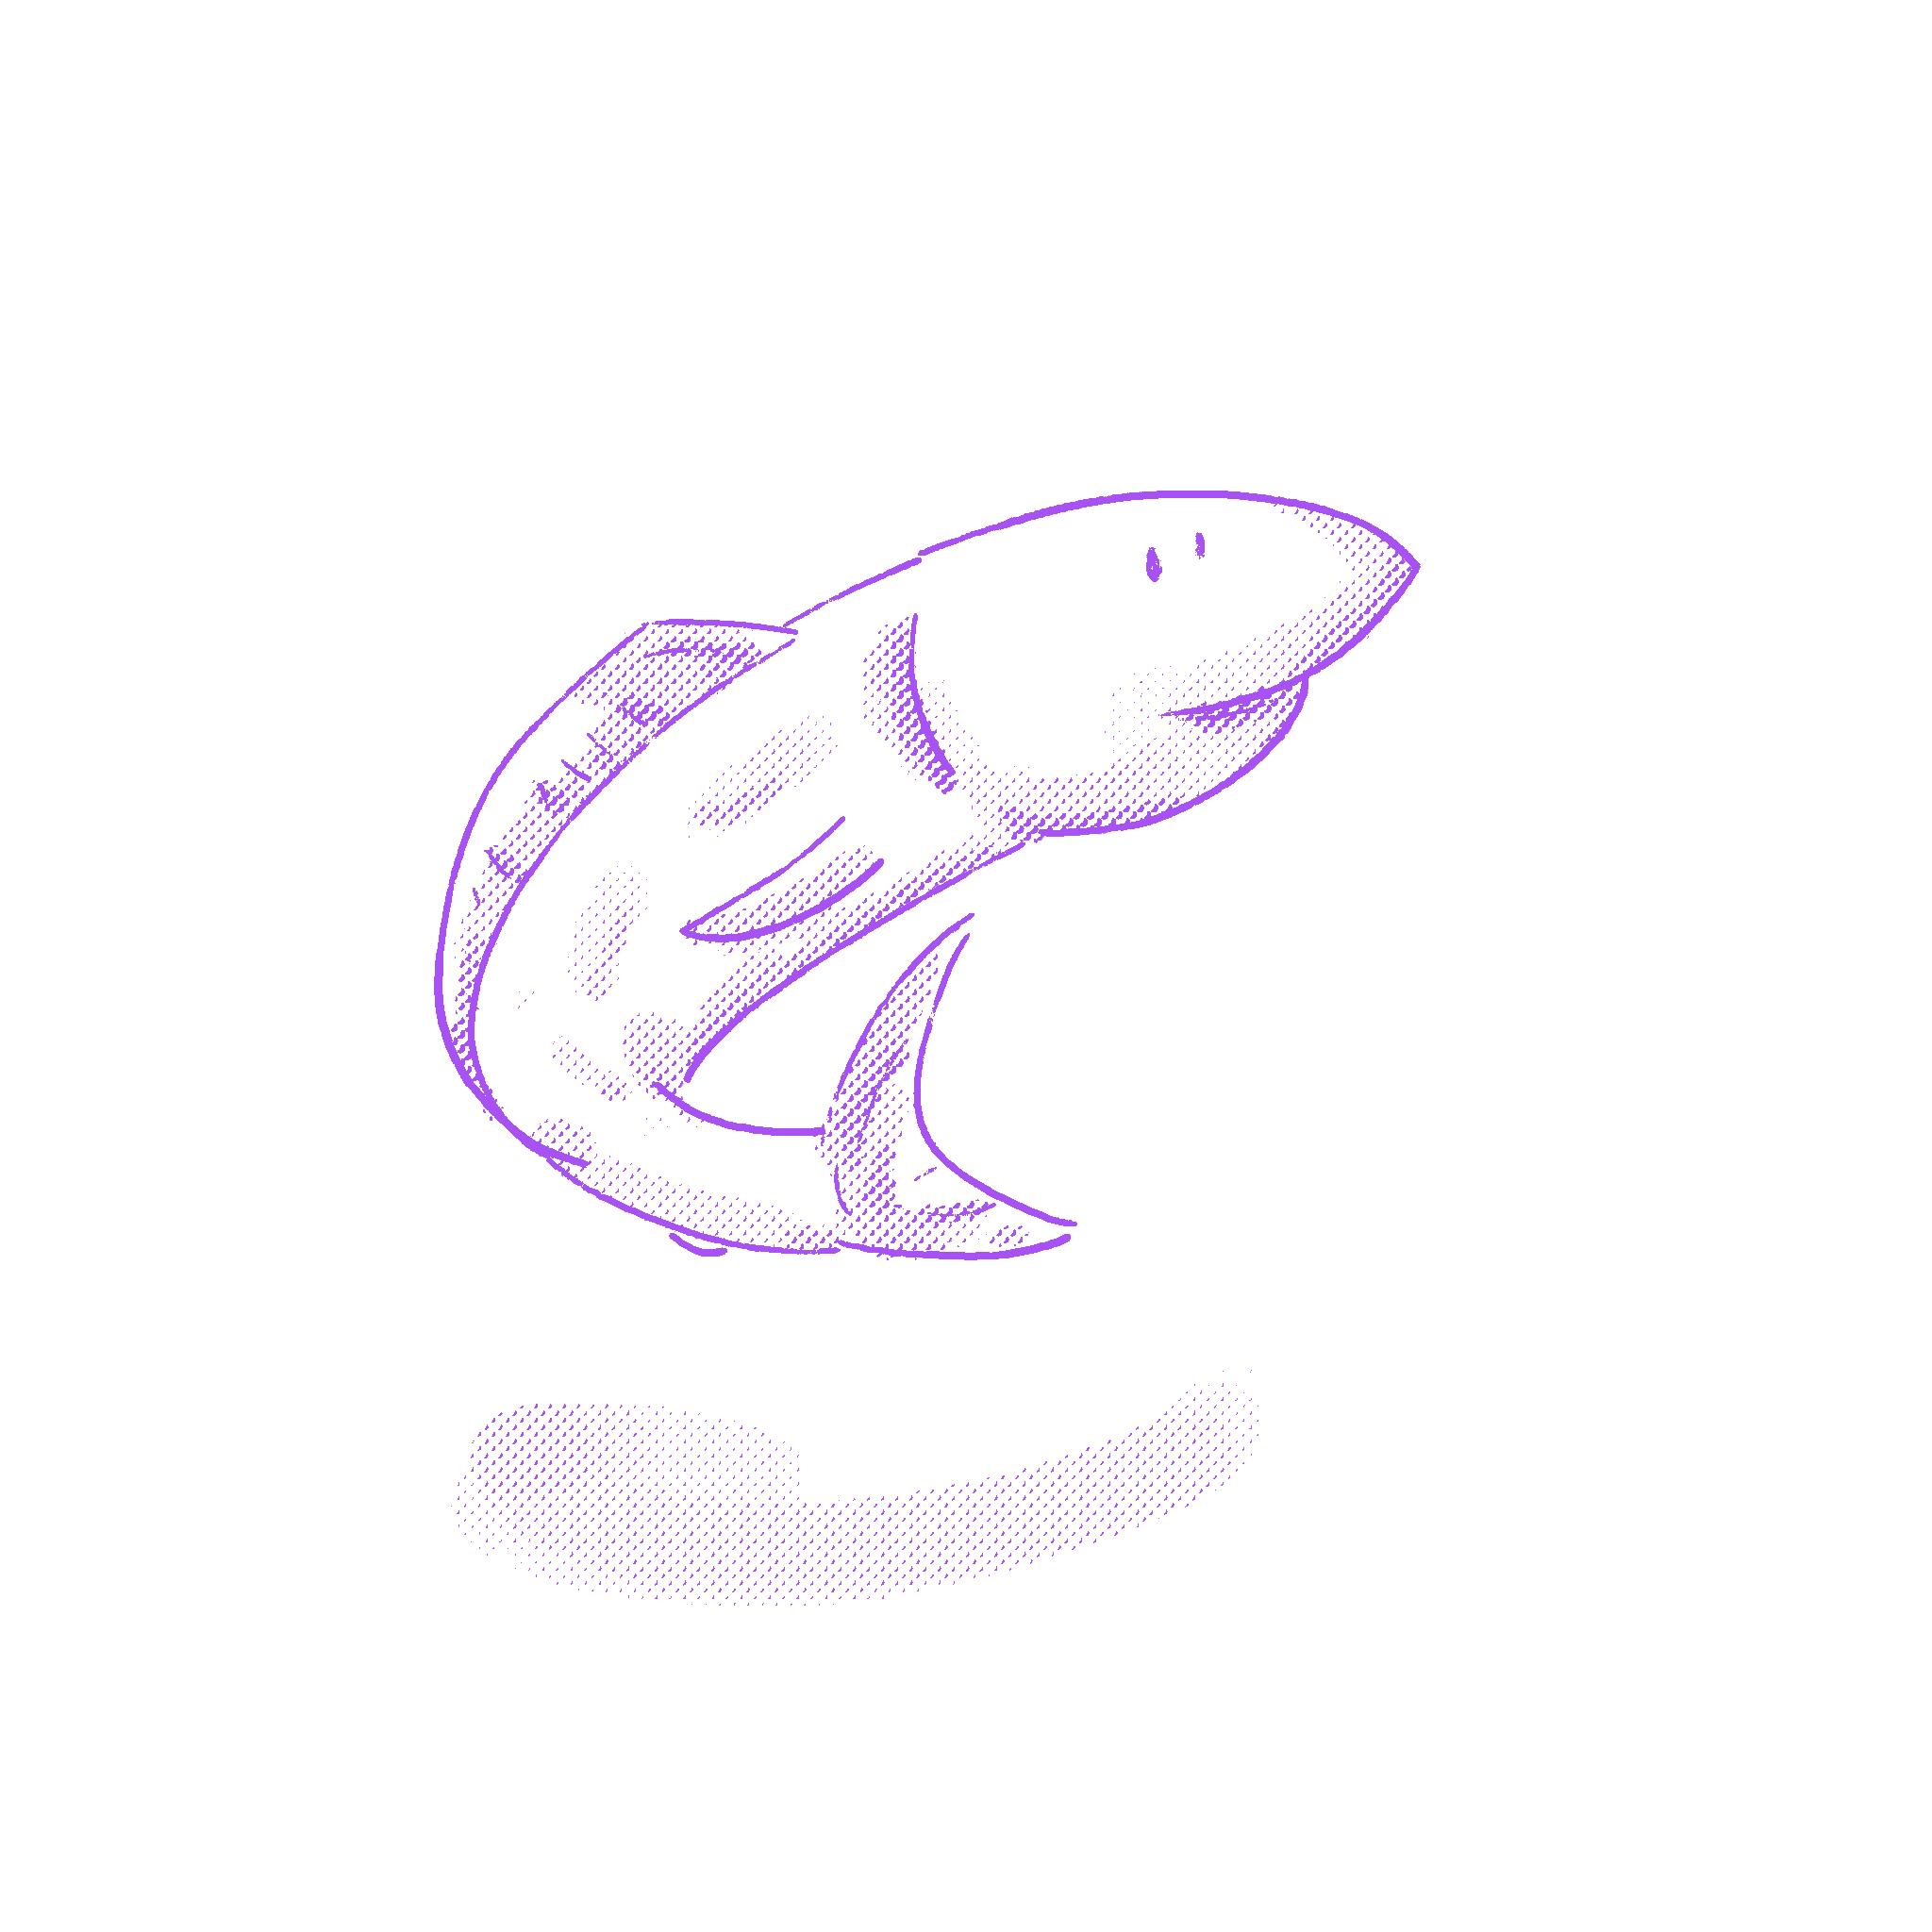 lac-bau-cua_tet-2018_2048x2048_190105_nh_v2.2_fish.png